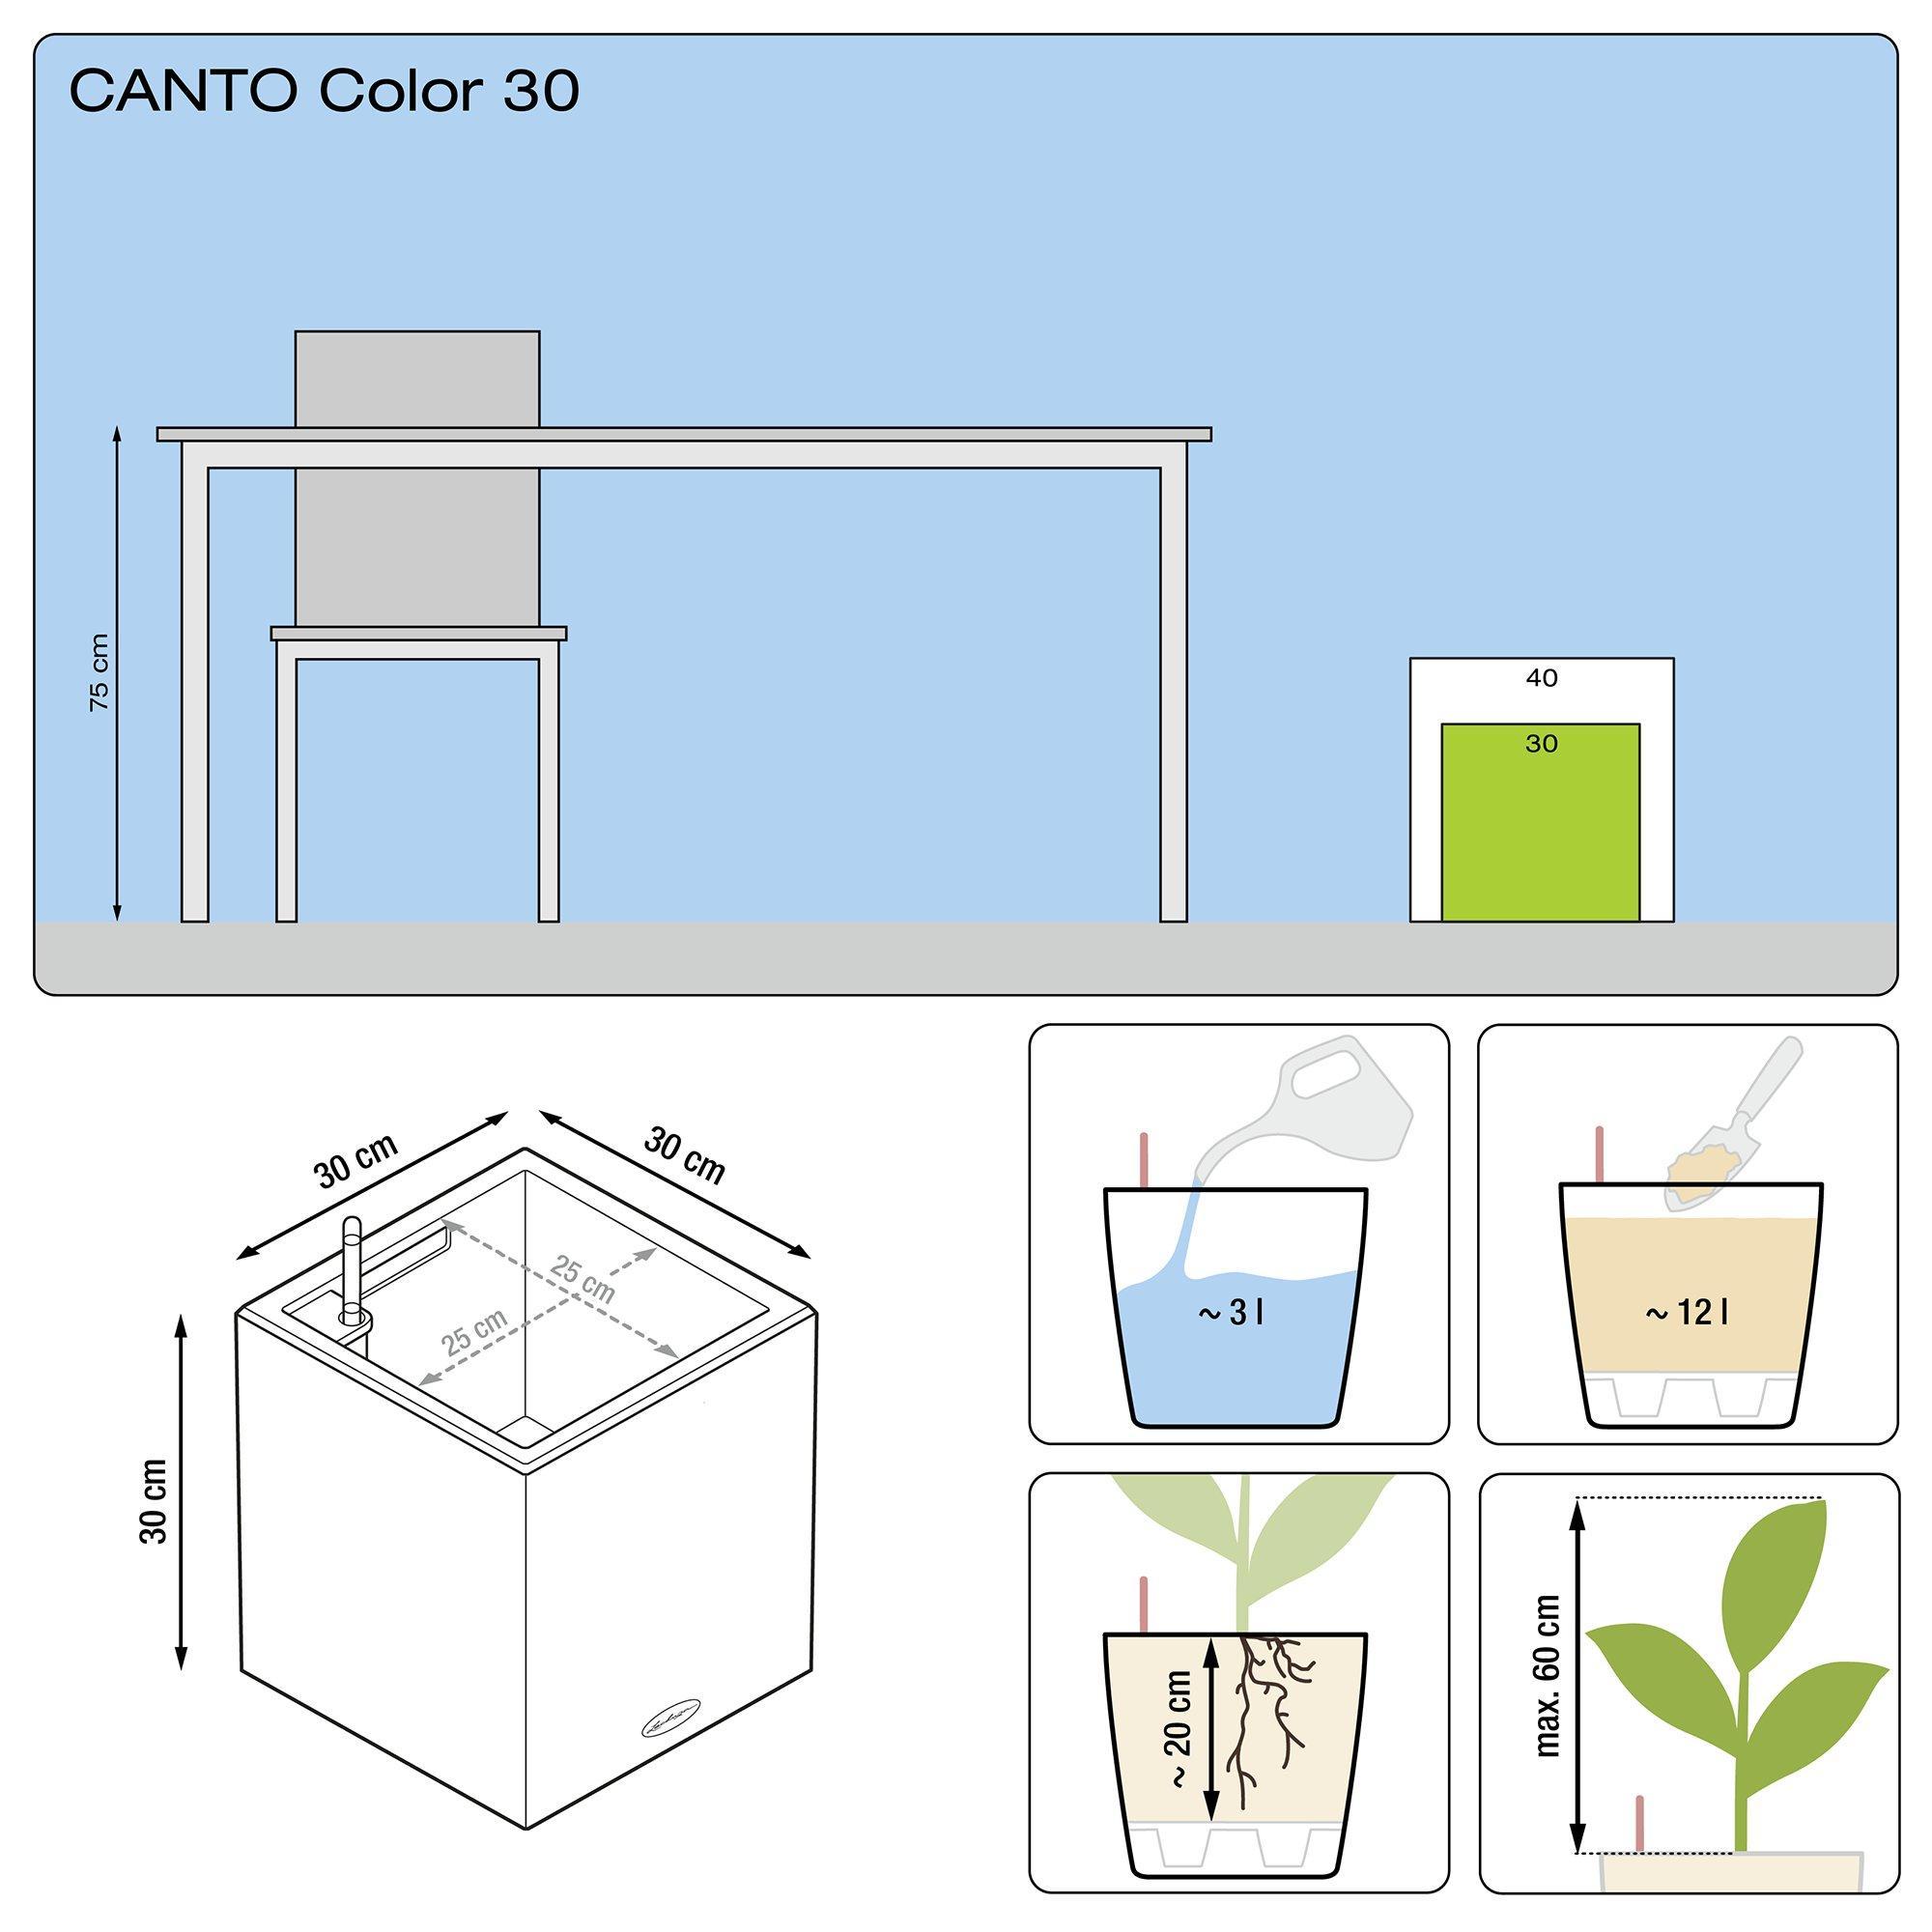 CANTO Color cube 30 stone gray - Image 3